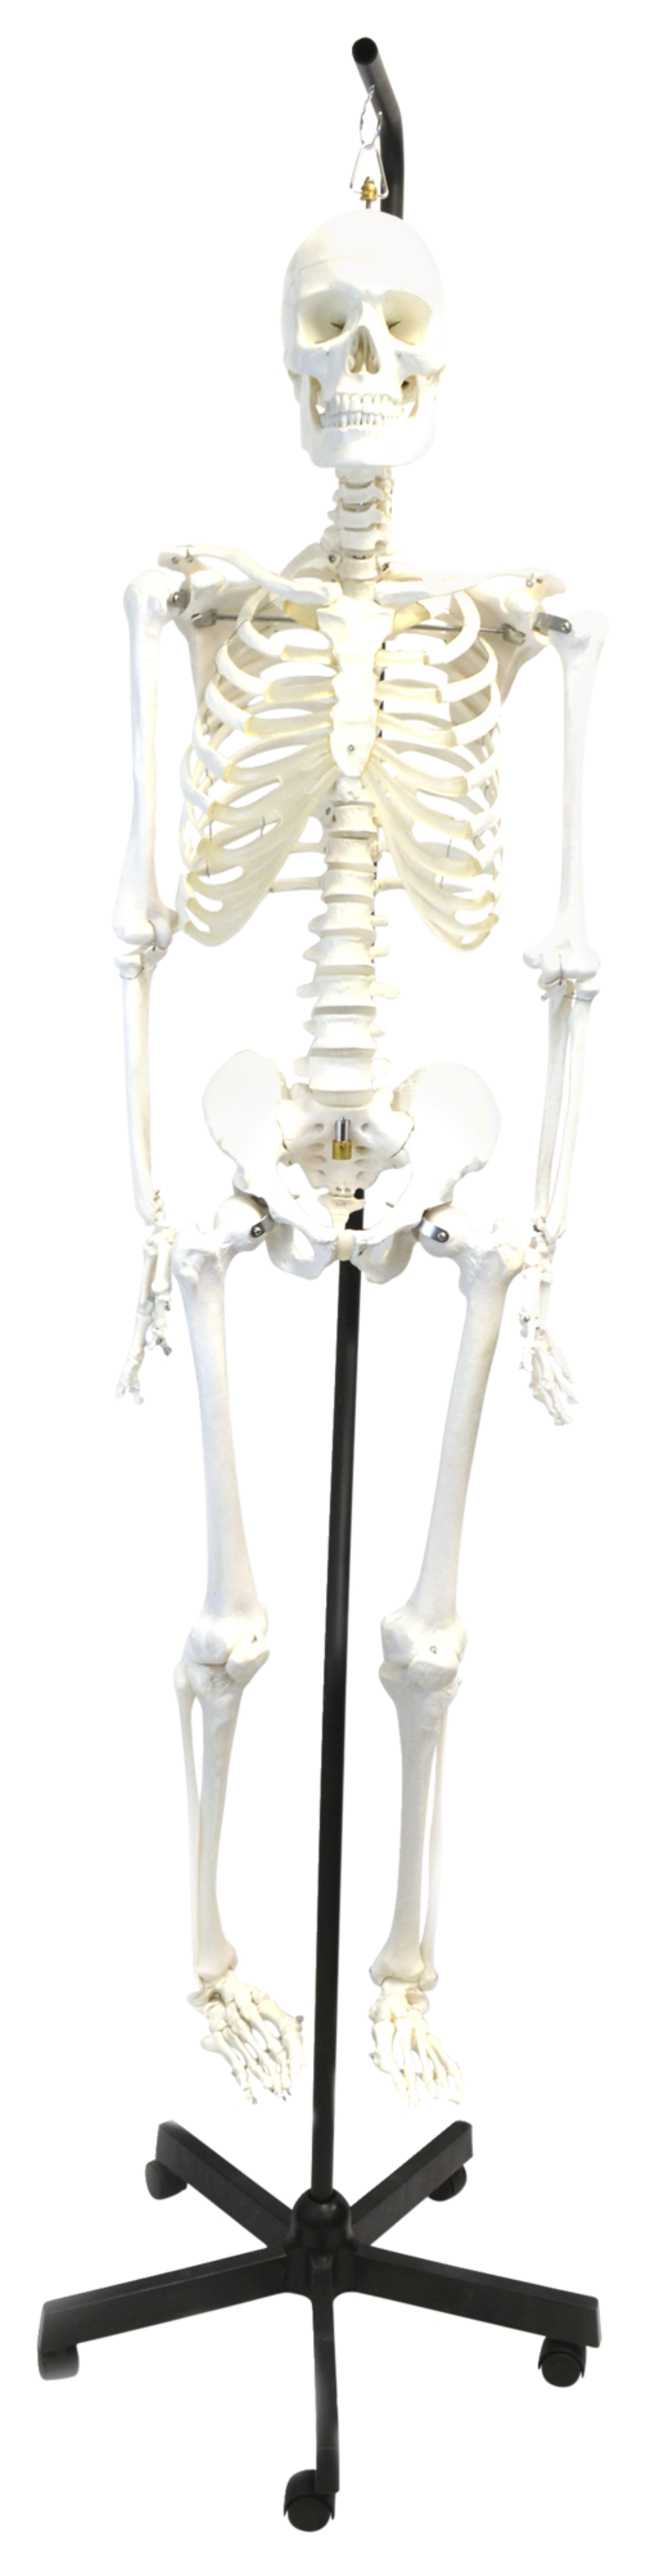 Lab and Anatomical Models, Item Number 2011738